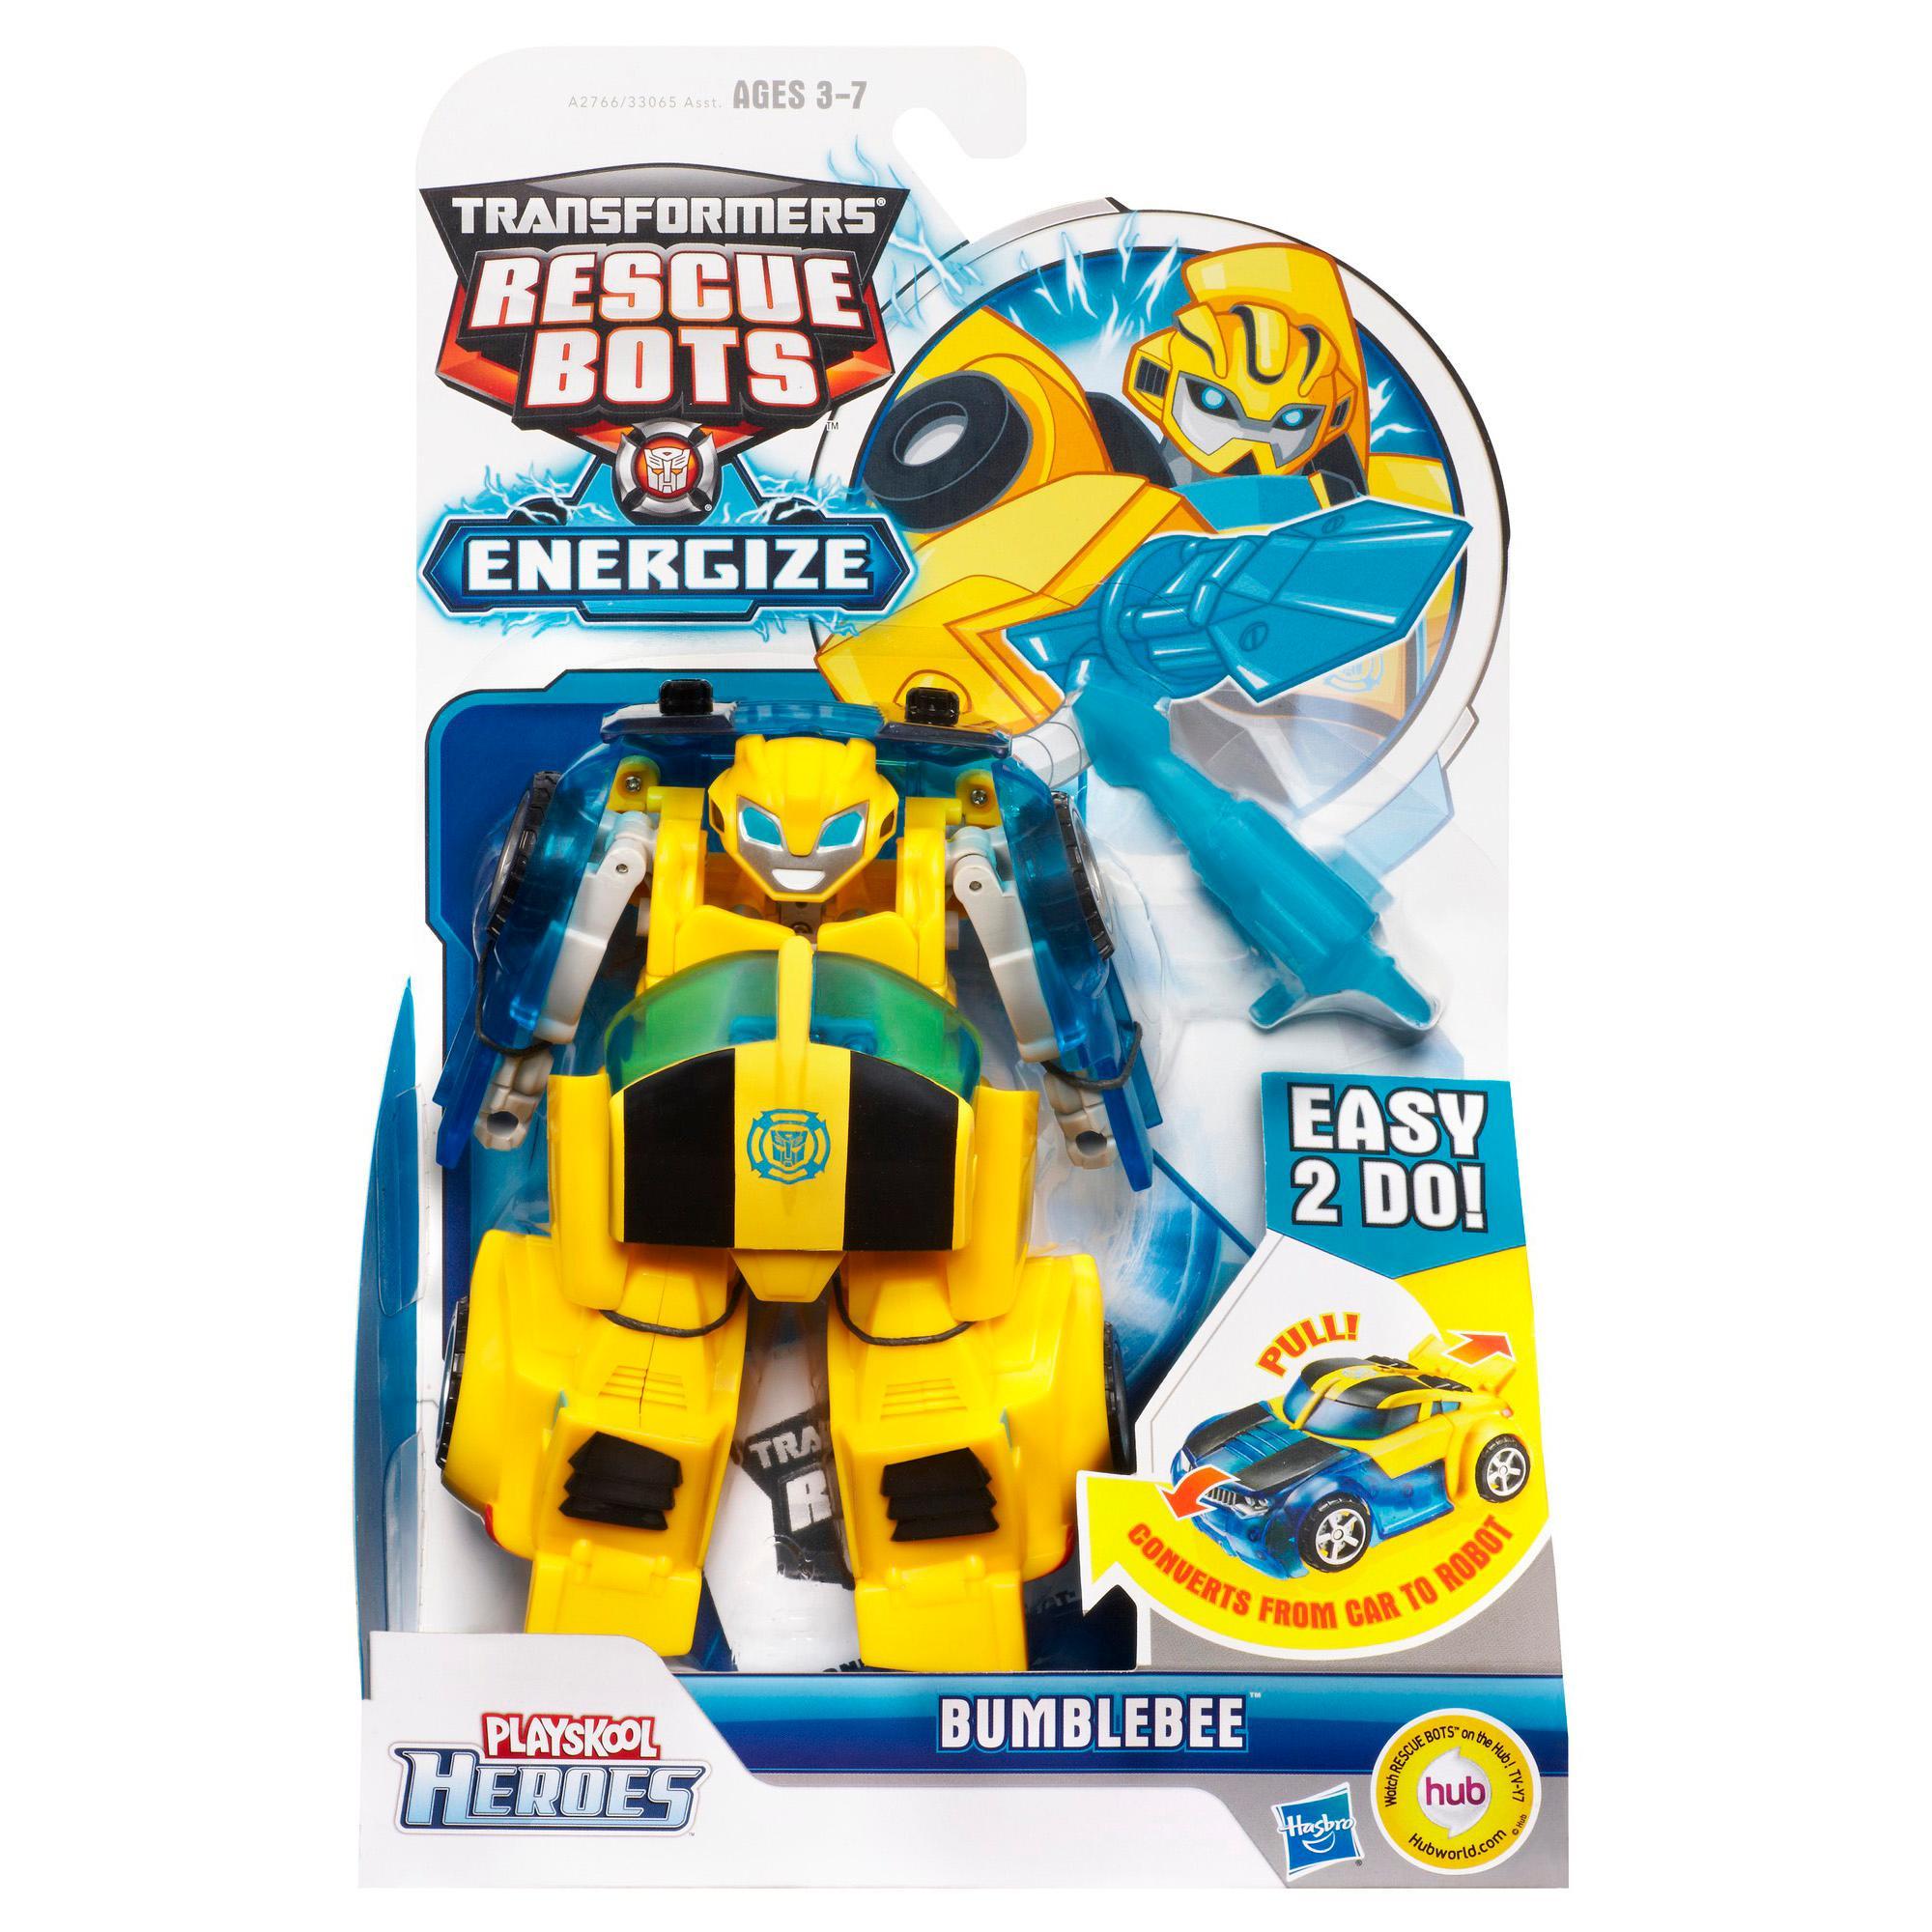 hasbro ultimate bumblebee transformer instructions